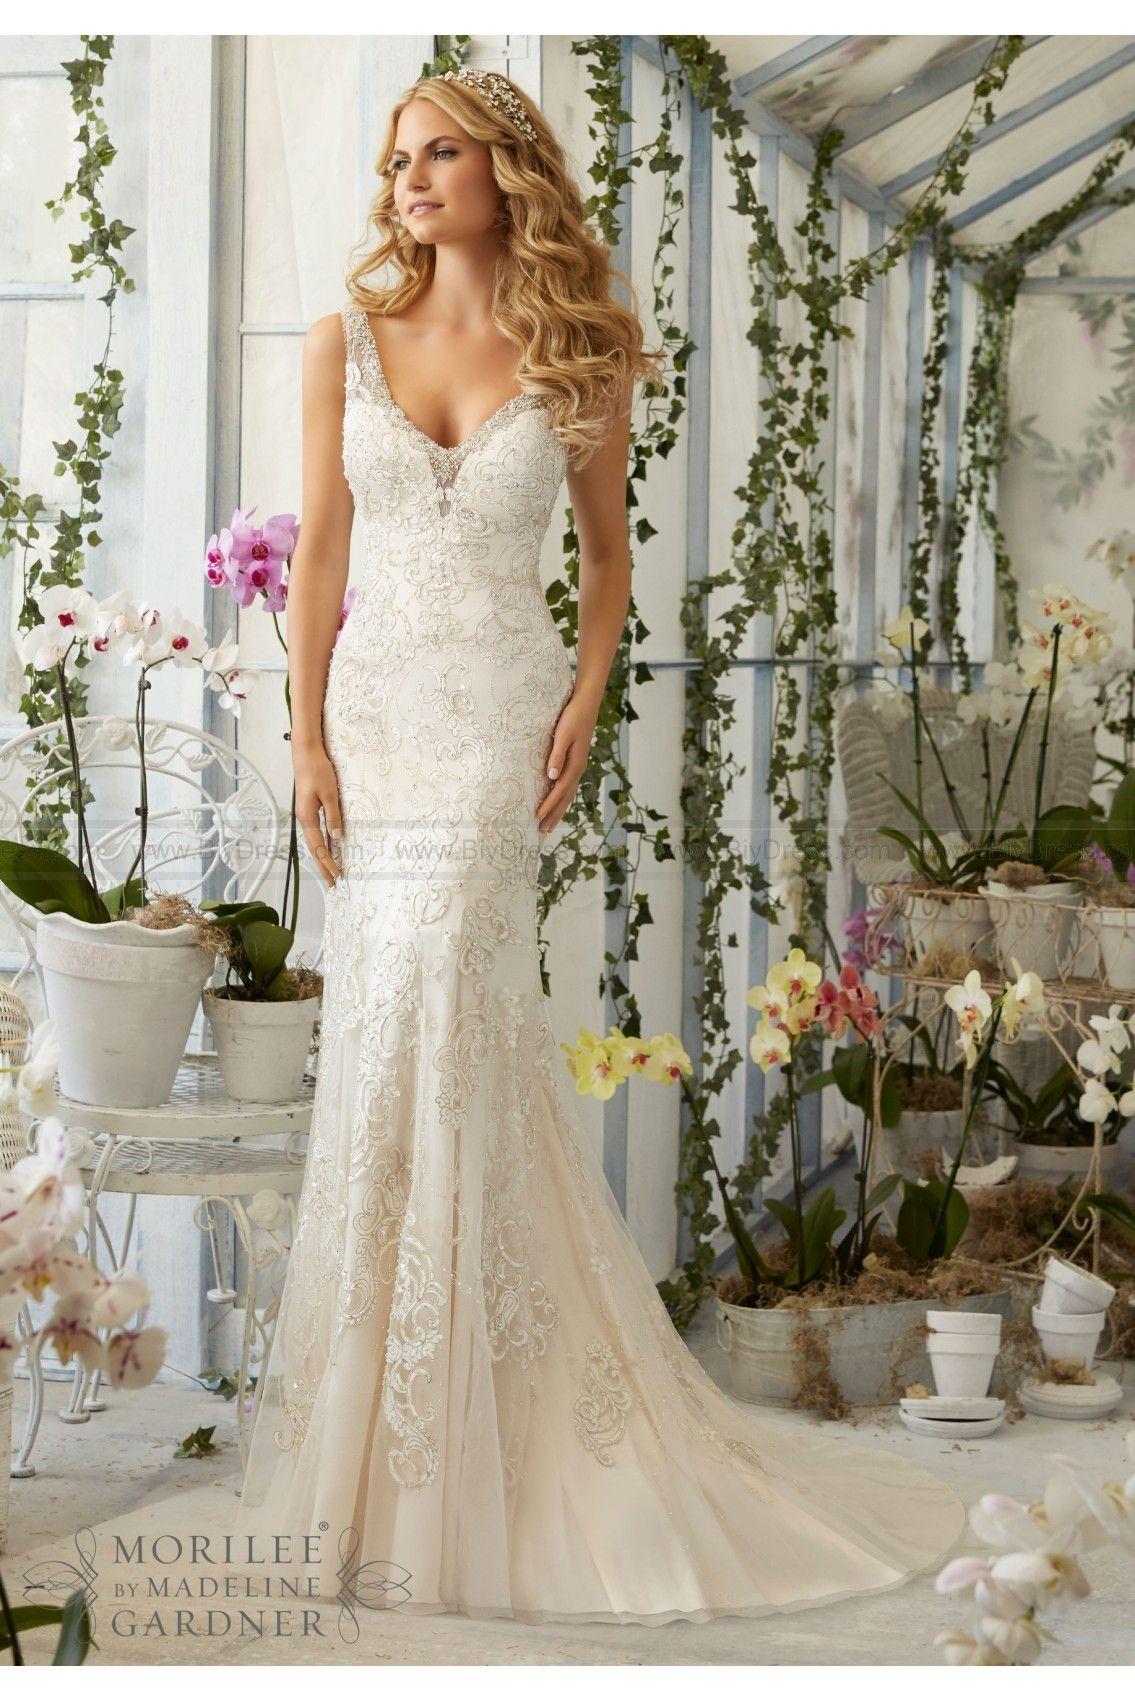 Mori Lee Wedding Dresses Style 2809 | mori lee wedding dresses 2016 ...